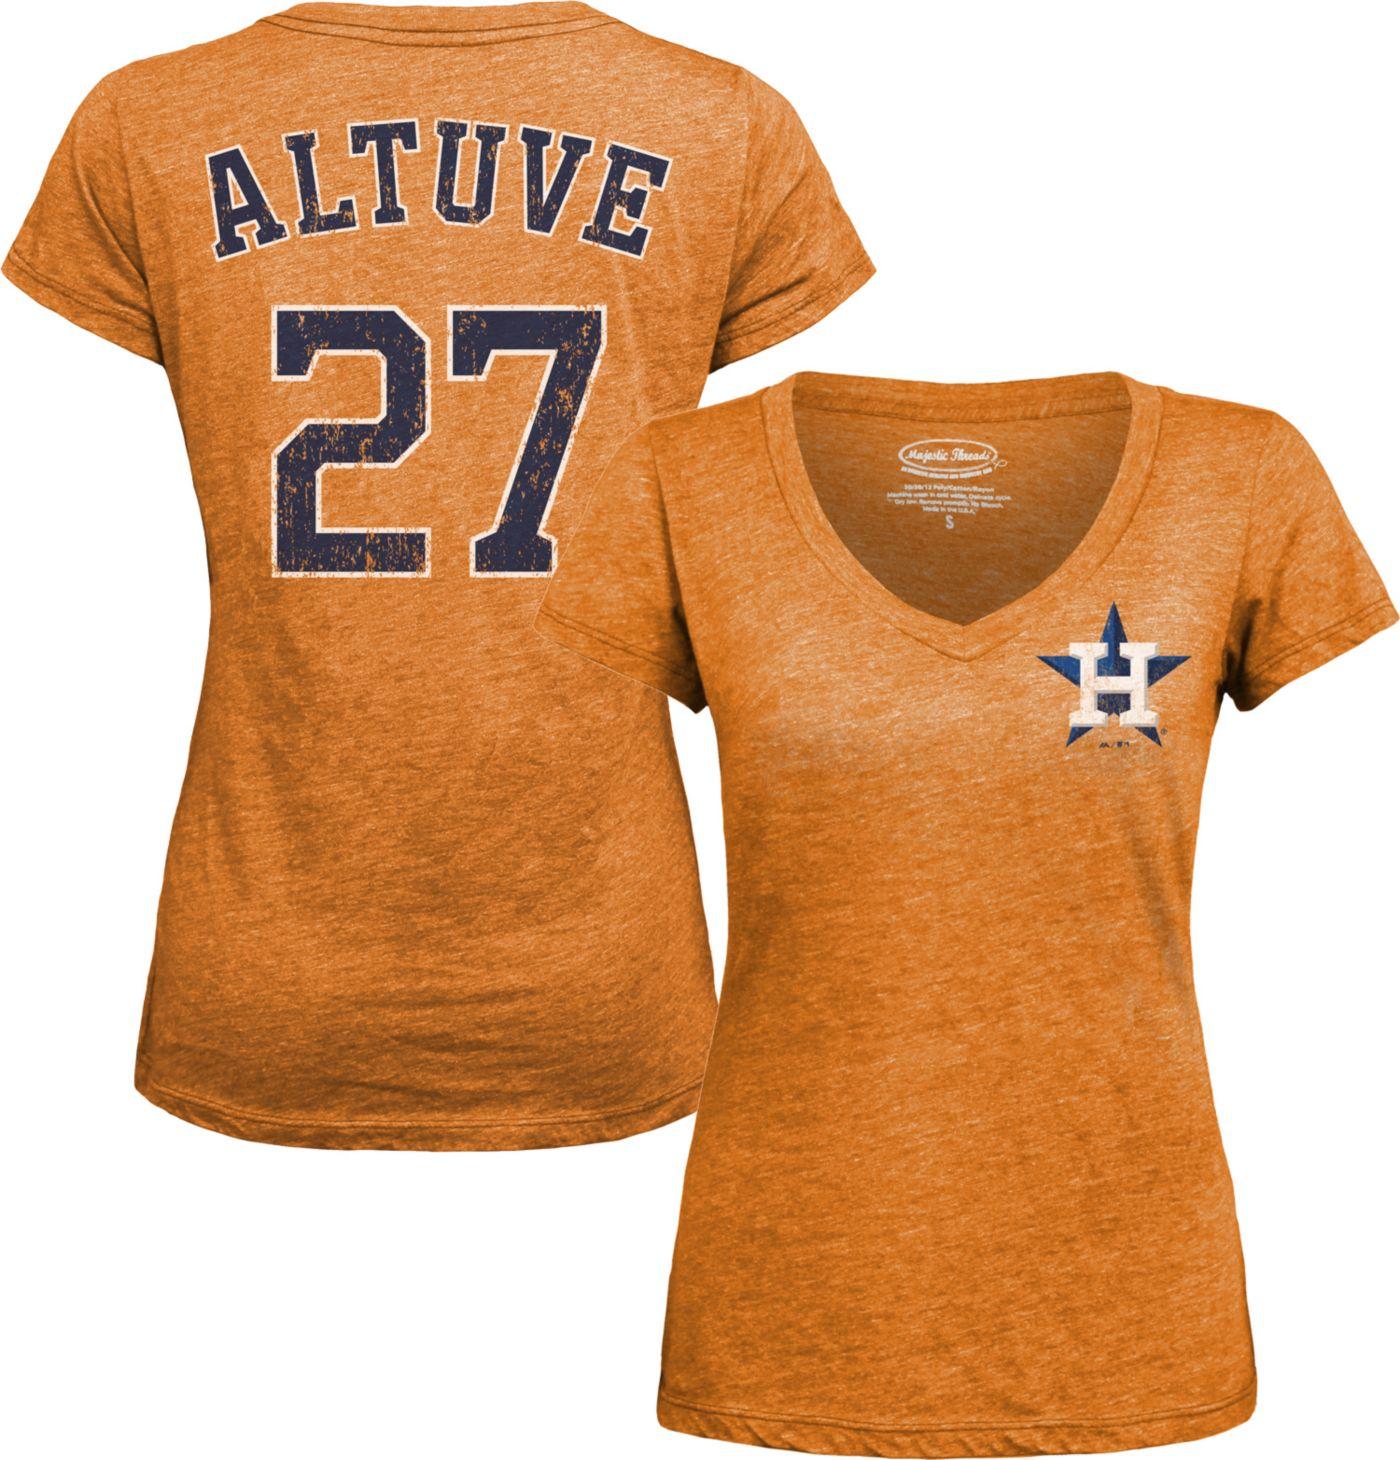 Majestic Threads Women's Houston Astros Jose Altuve Orange V-Neck T-Shirt